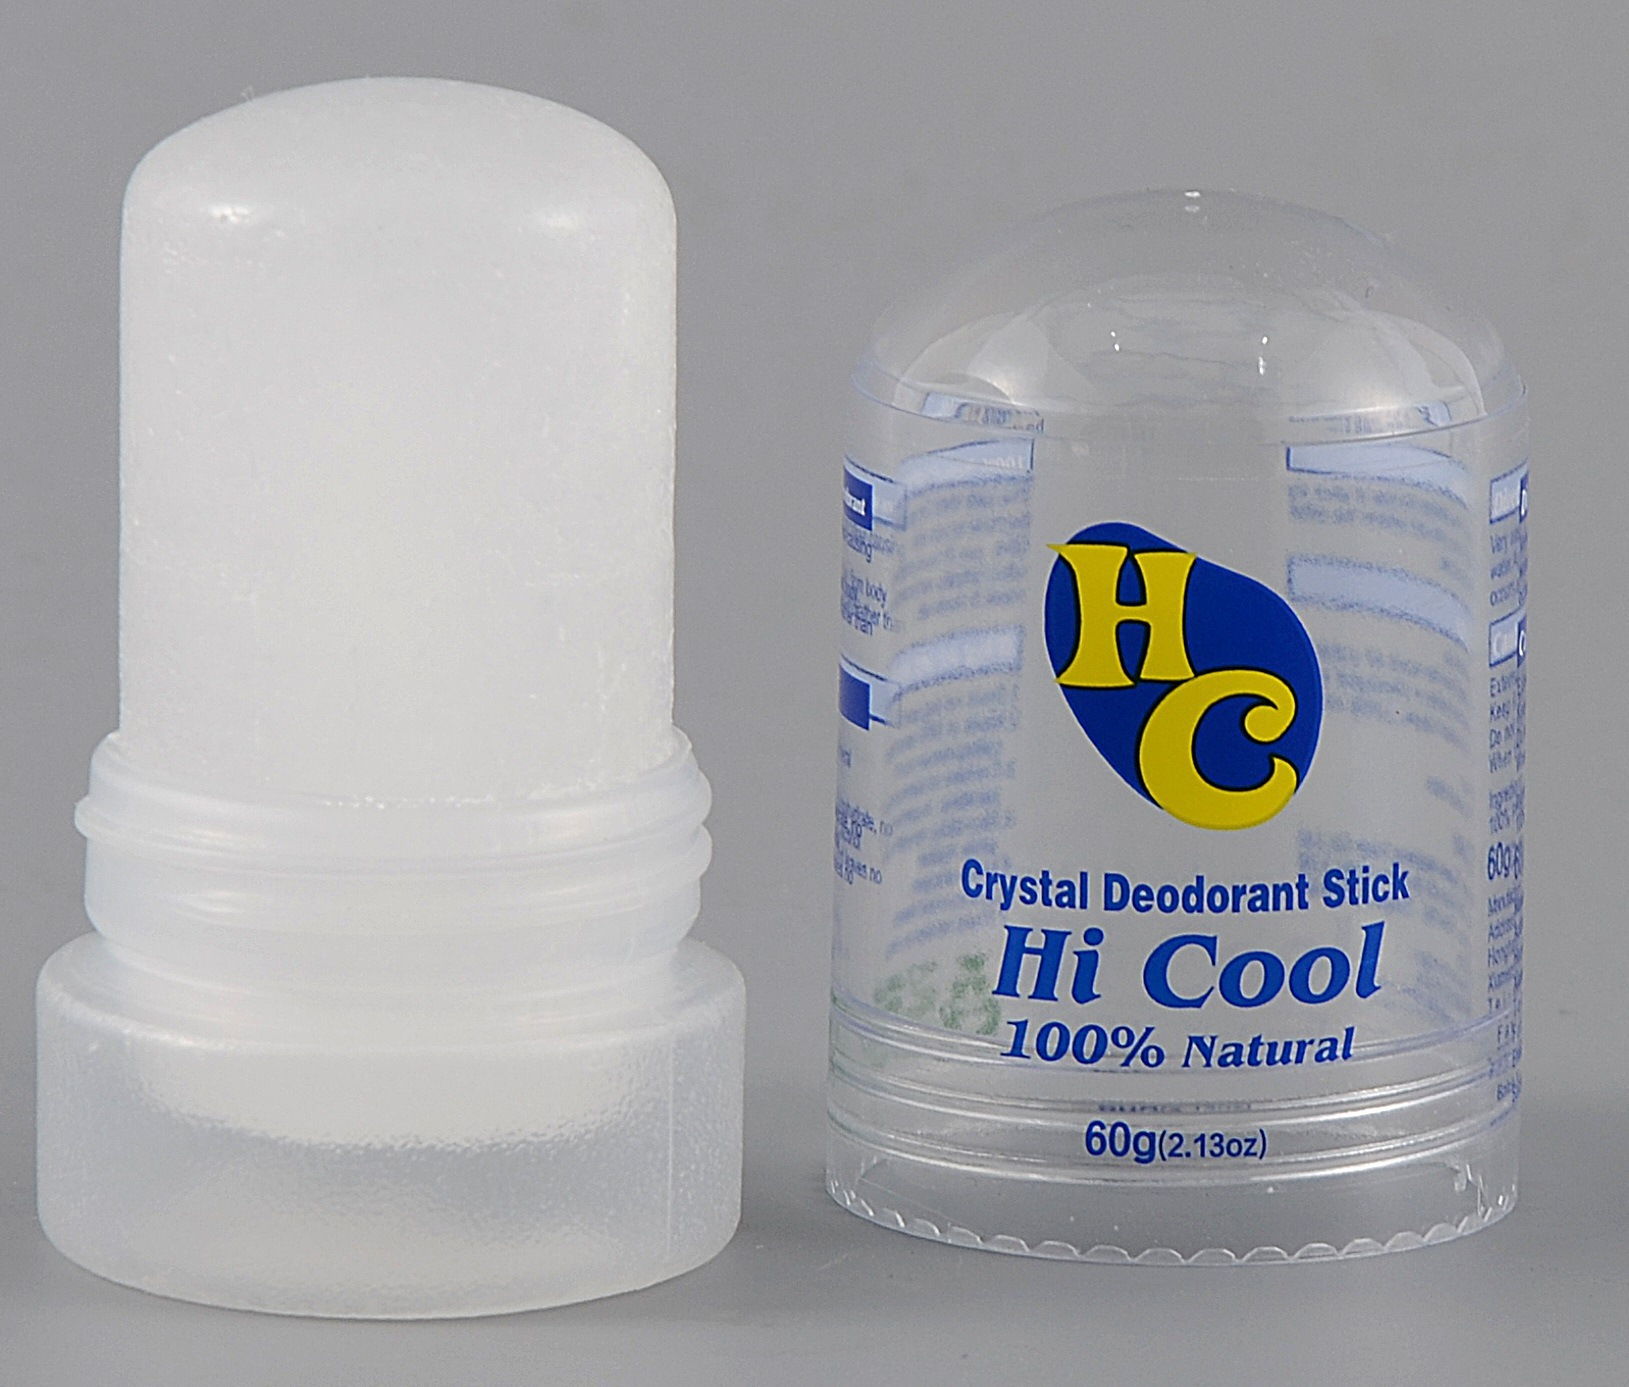 Alum antitranspirante desodorante corpo cristal axilas antitranspirante desodorante pedra cuidado do corpo desodorante